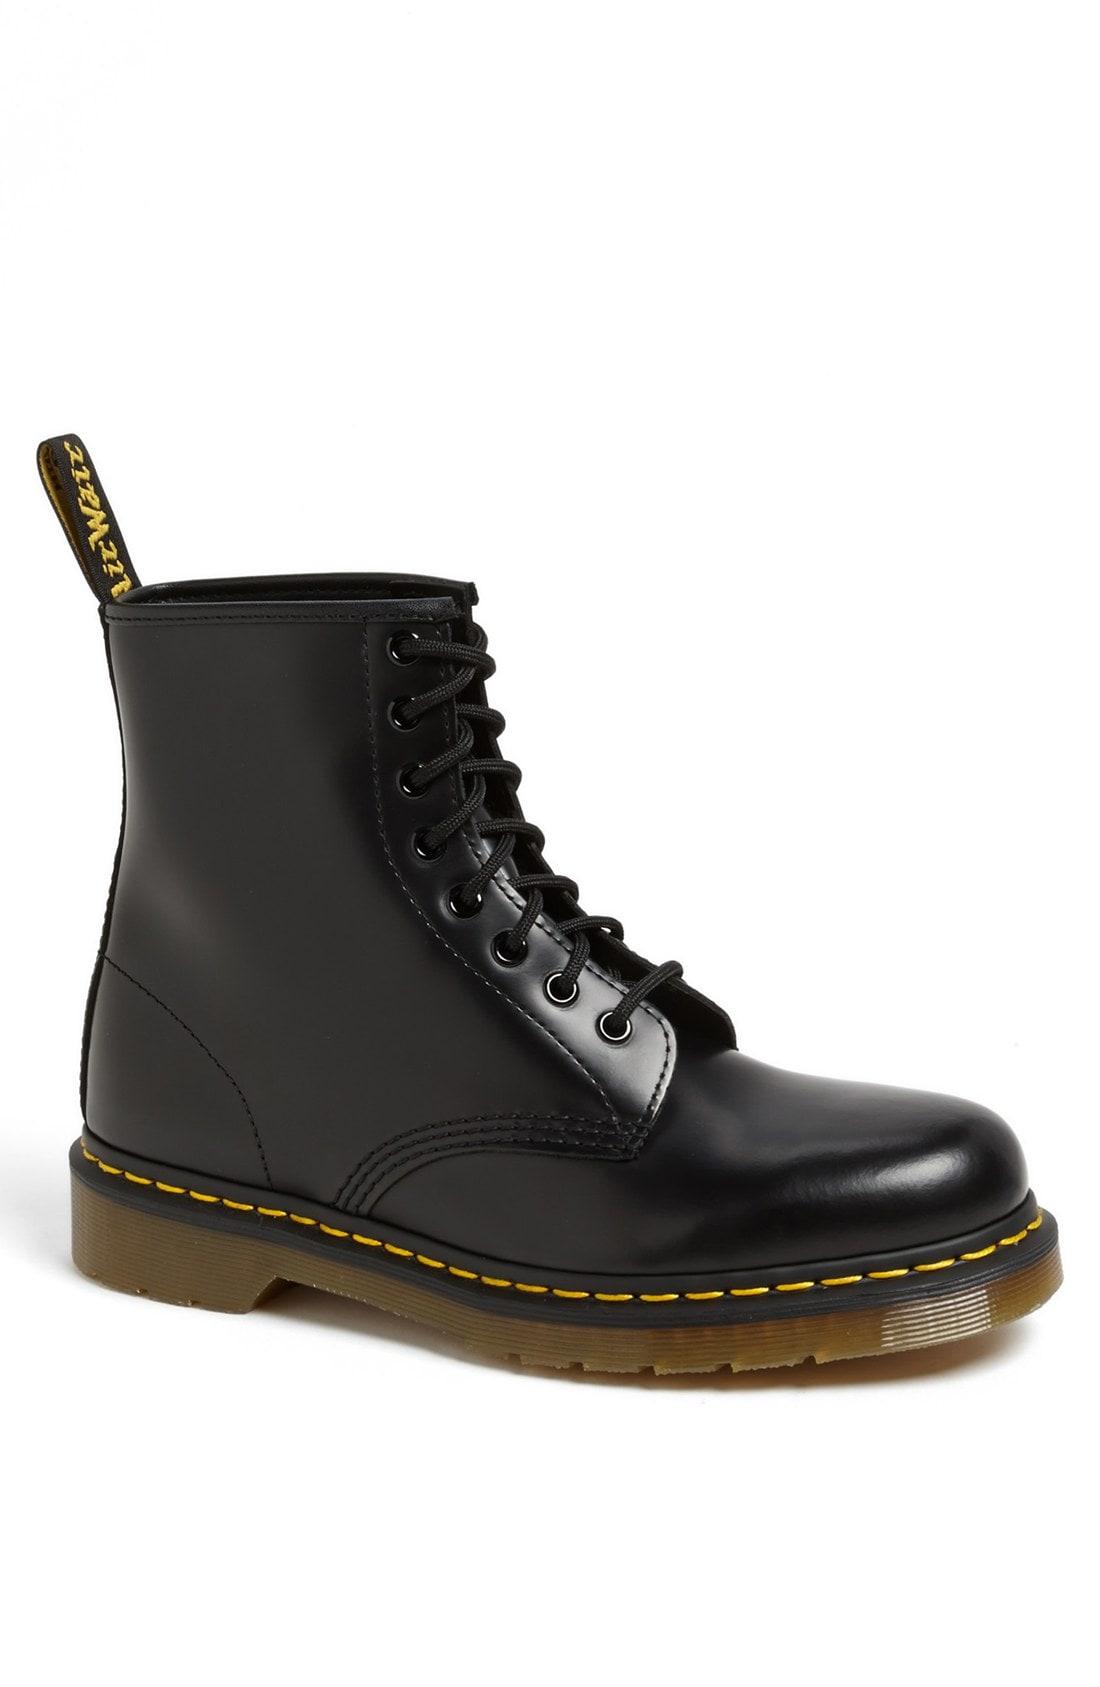 Mens Boots | Nordstrom